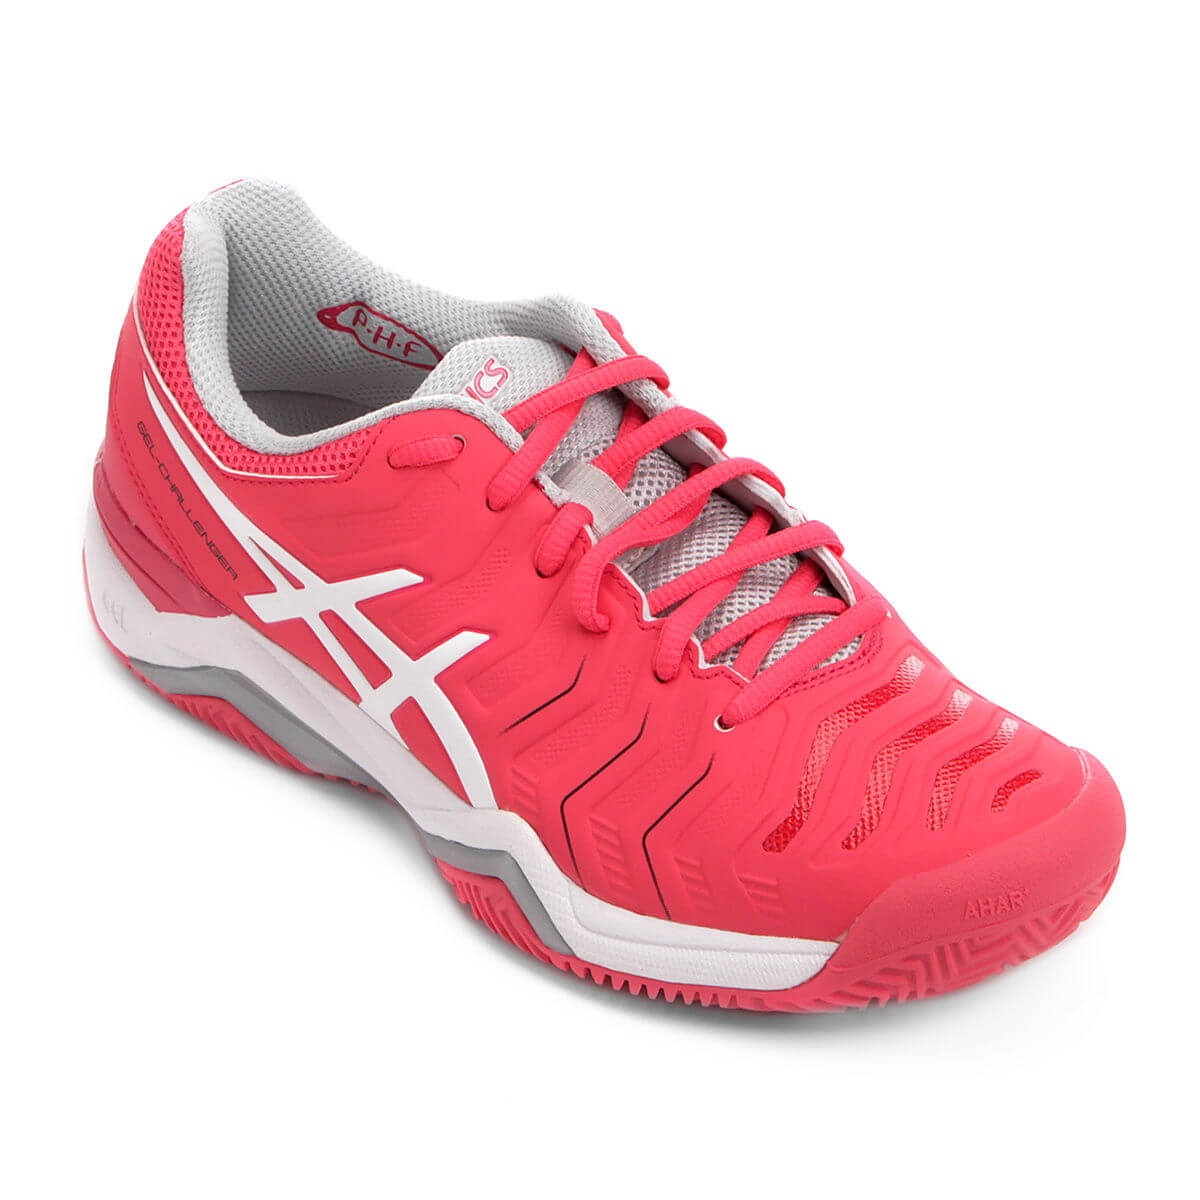 tênis asics gel challenger 11 clay feminino. Carregando zoom. c87fe4cdfabcd